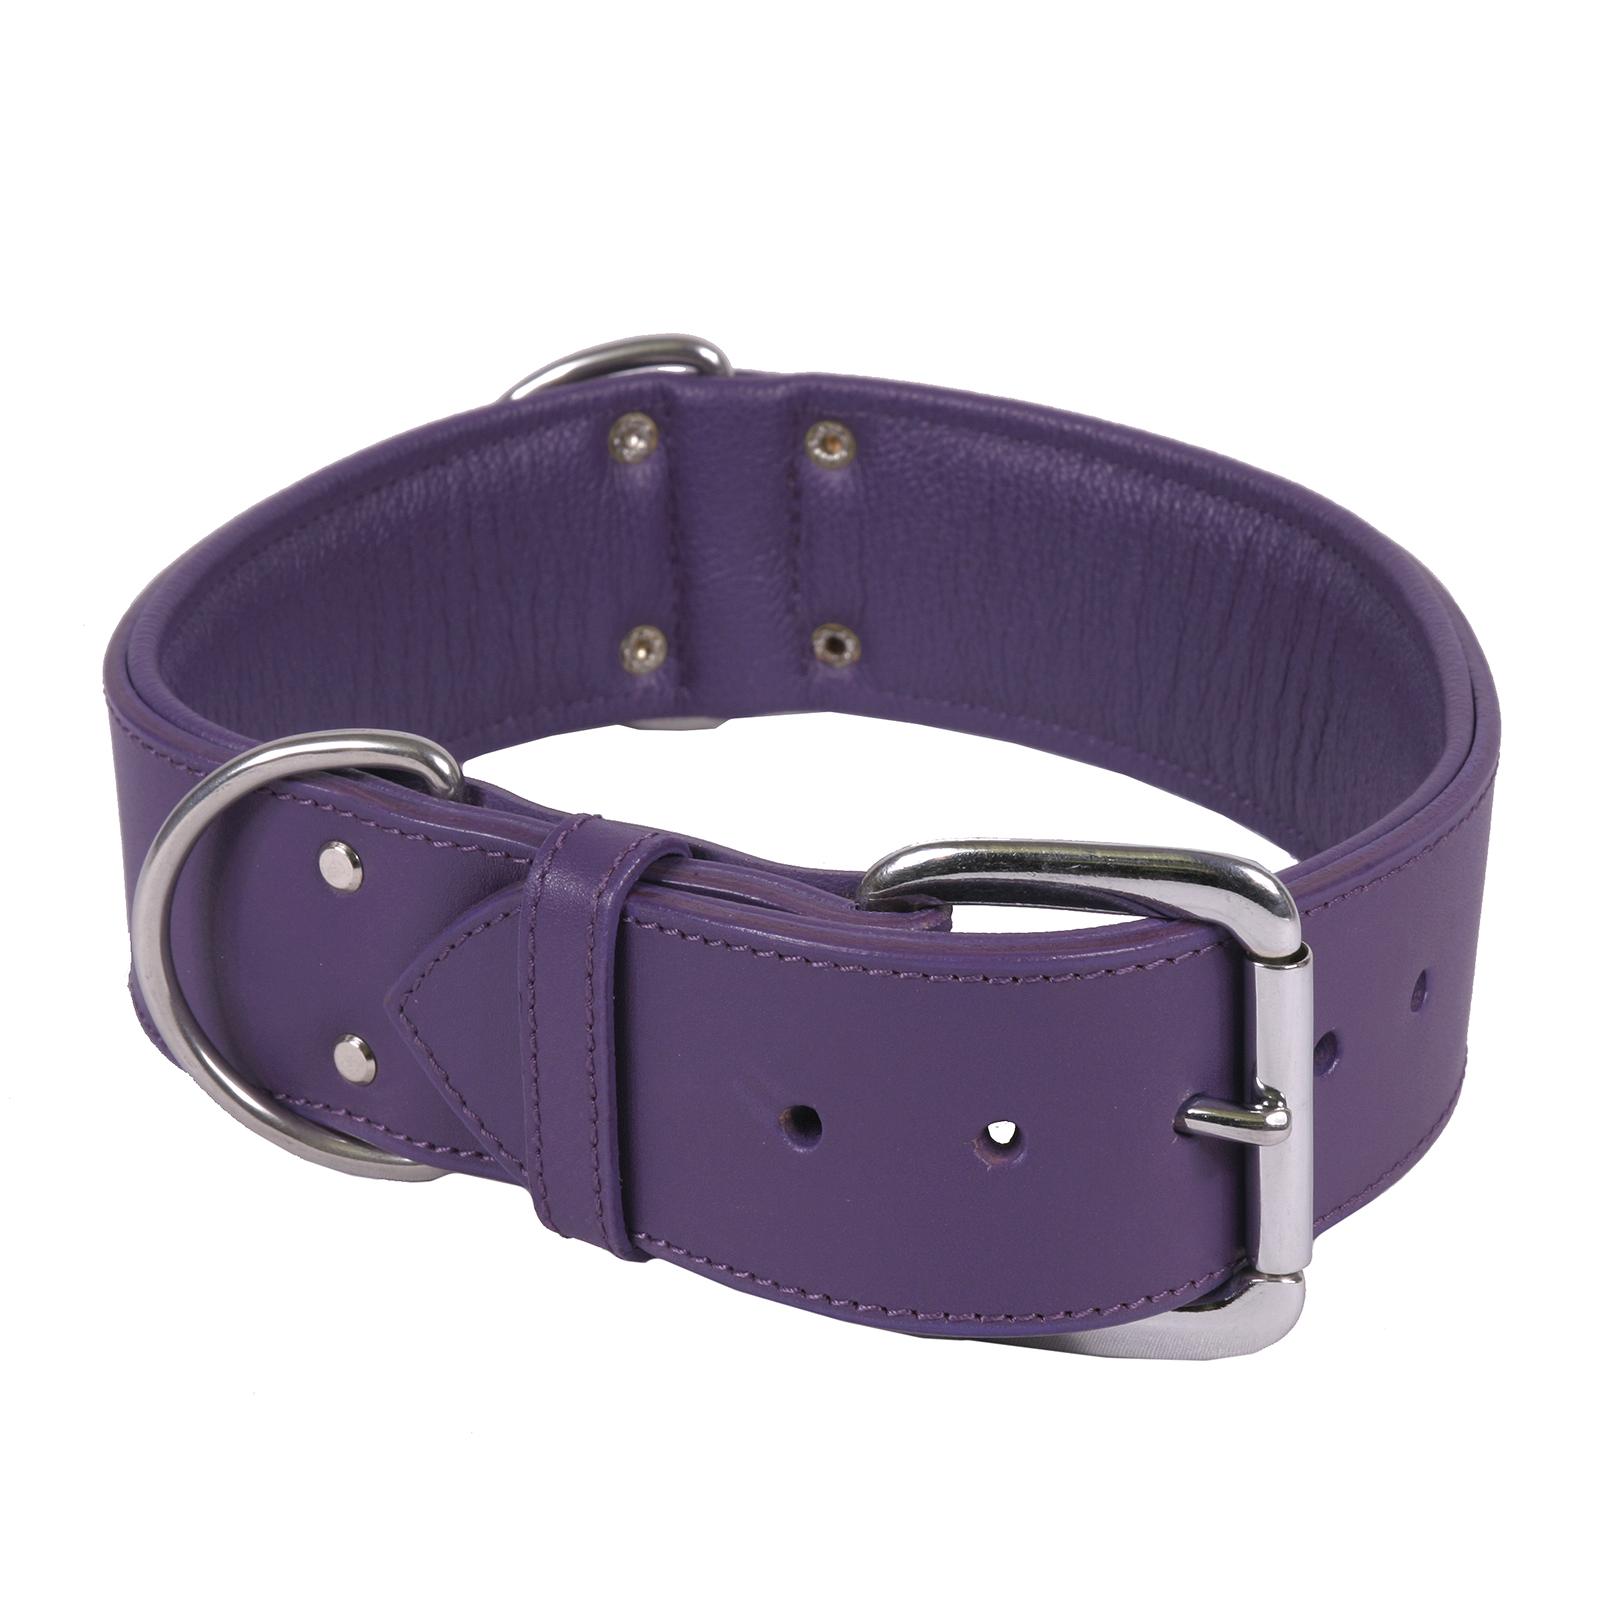 Hot Dog The Dallas - Luxury Leather Dog Collar